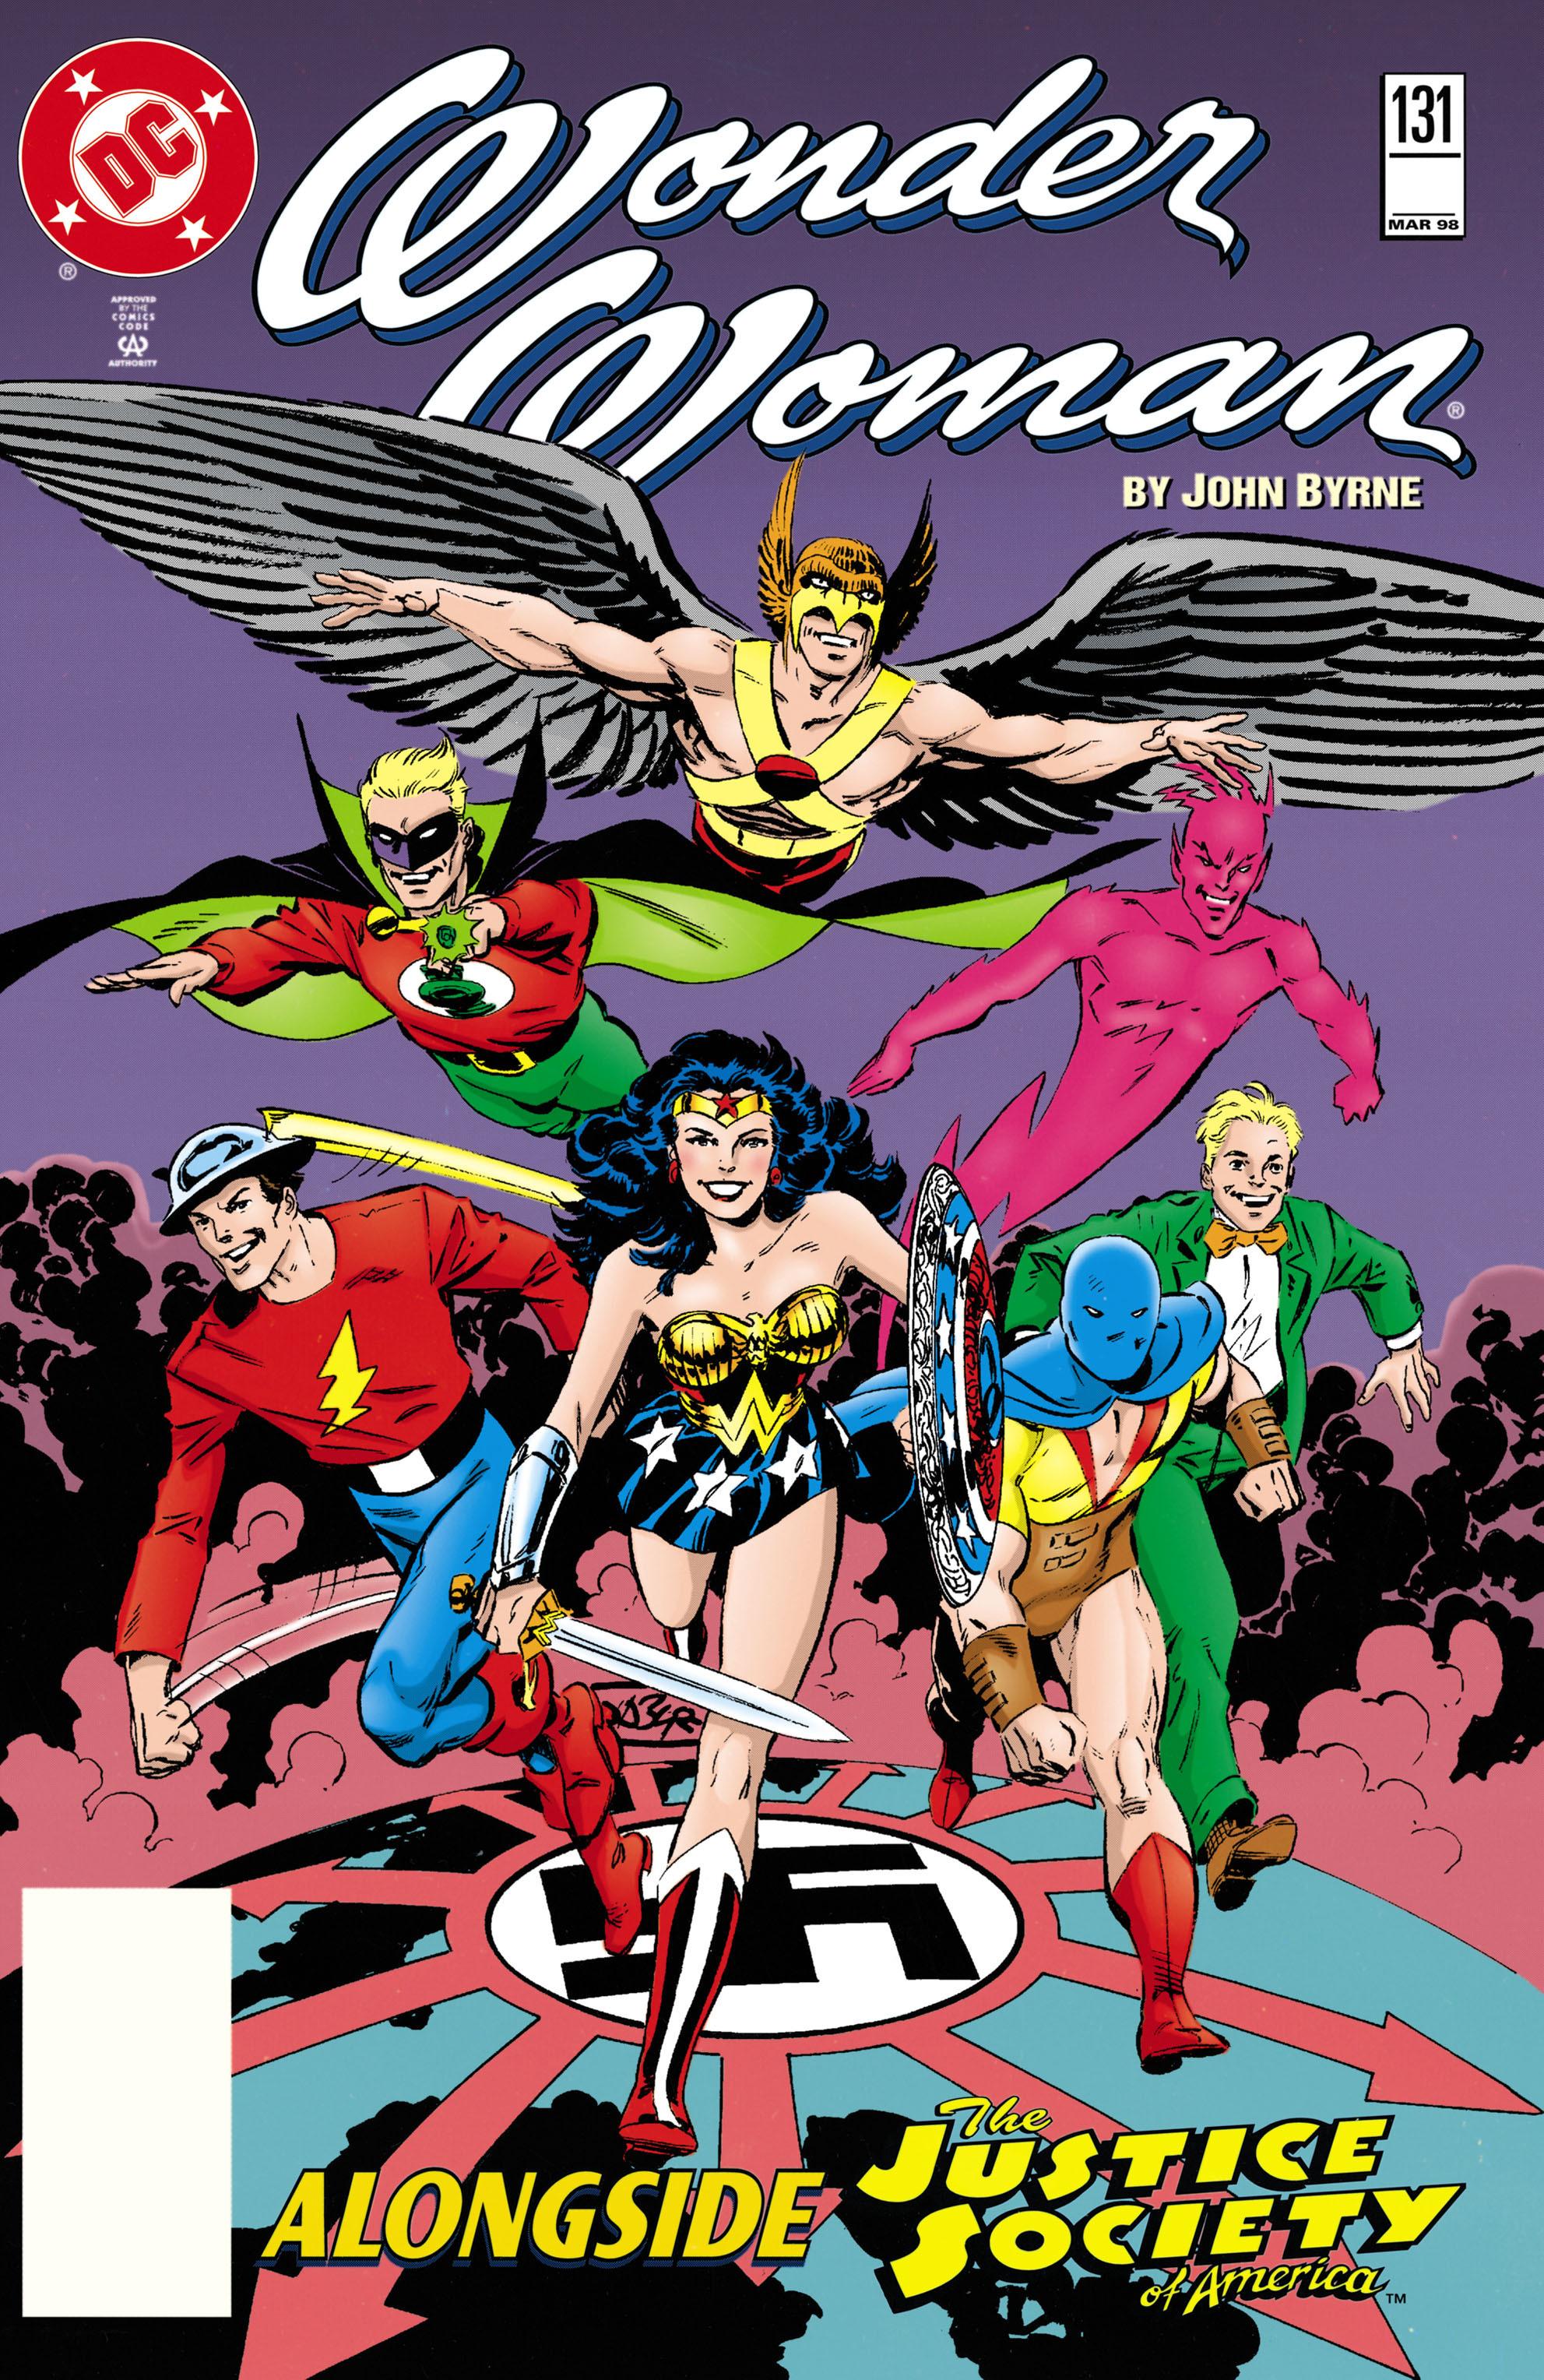 Read online Wonder Woman (1987) comic -  Issue #131 - 1